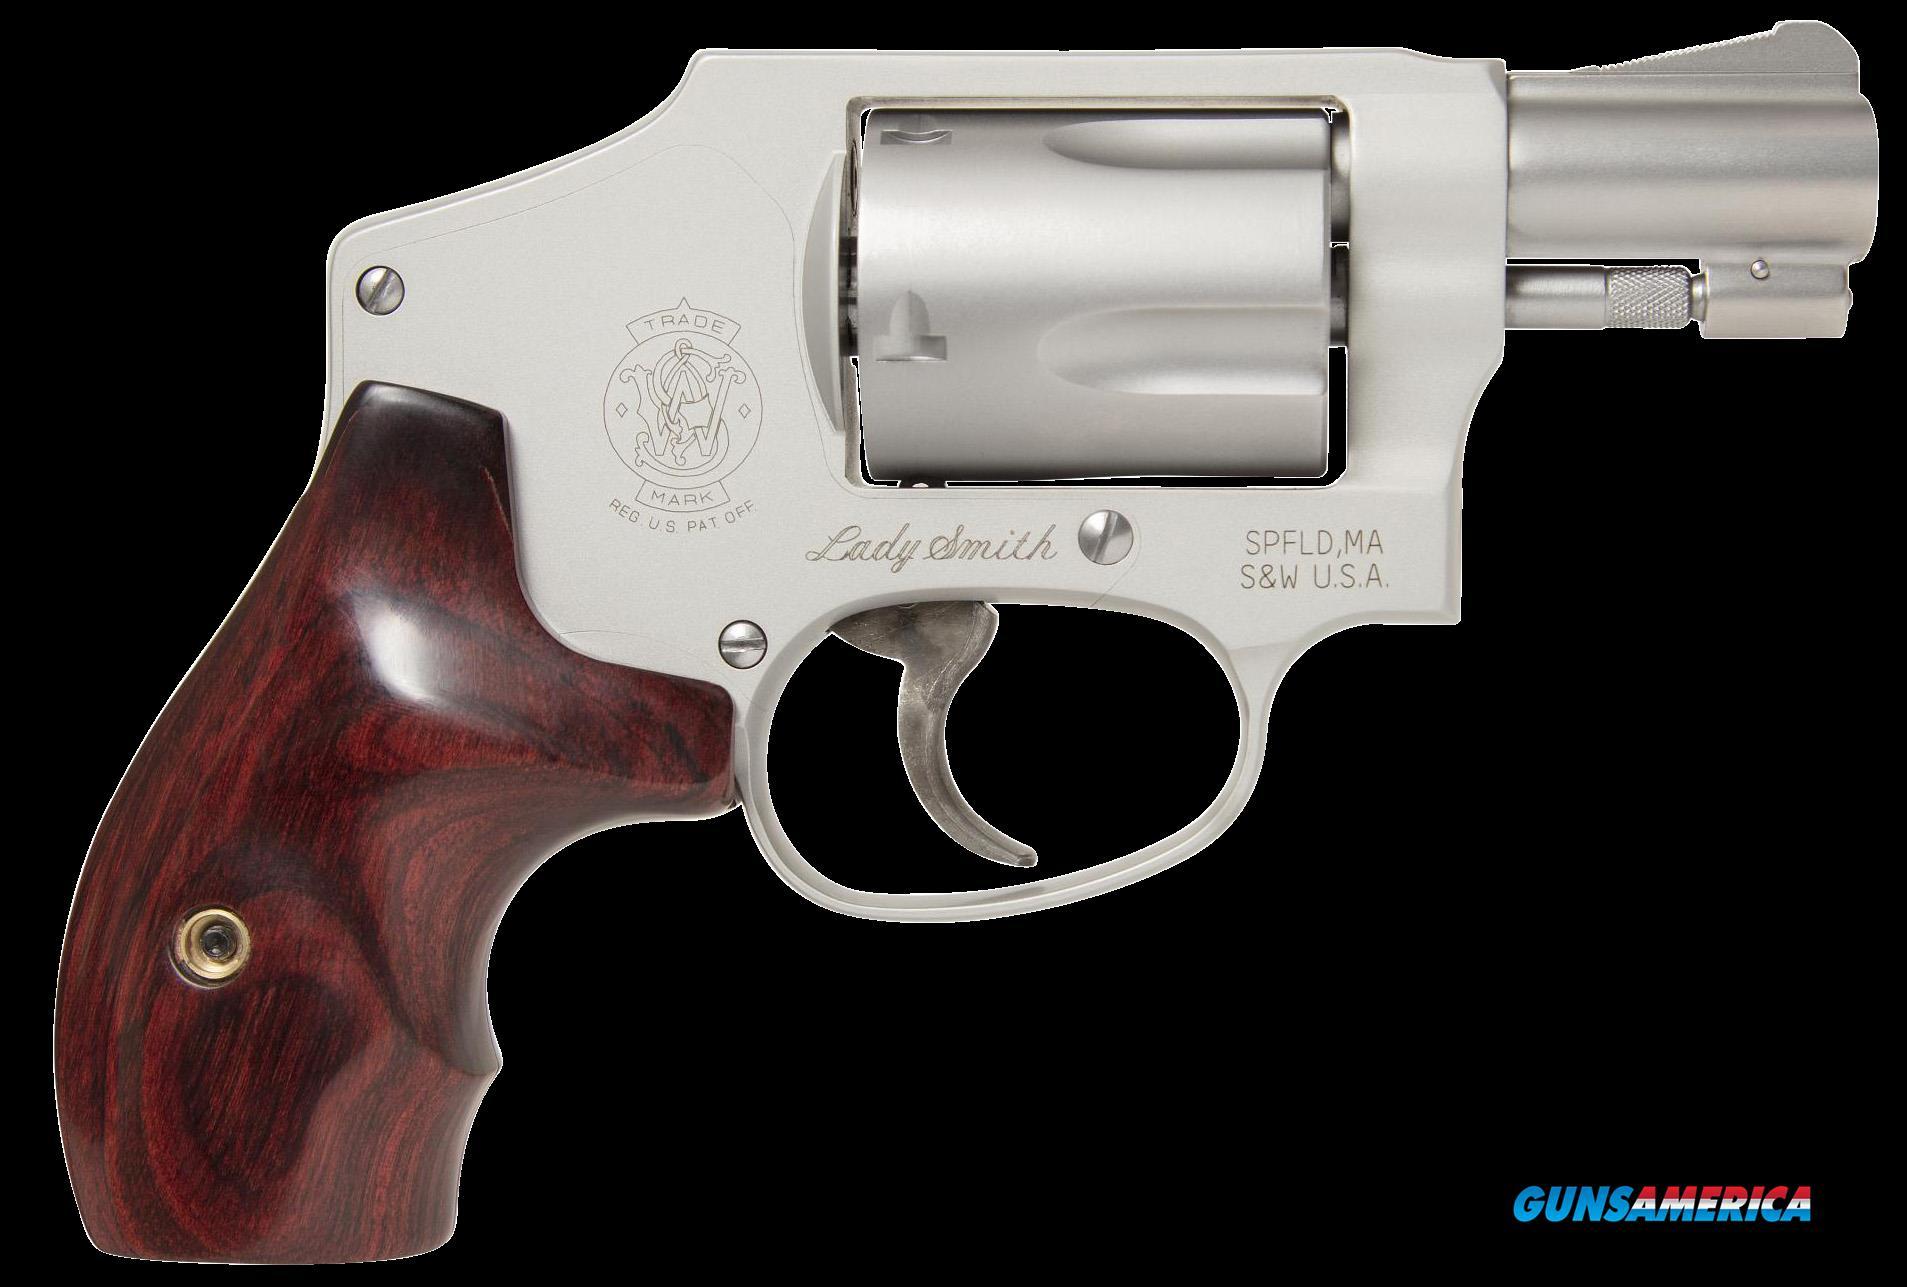 Smith & Wesson 642, S&w M642      163808 38  17-8 Ladysw    Ss  Guns > Pistols > 1911 Pistol Copies (non-Colt)